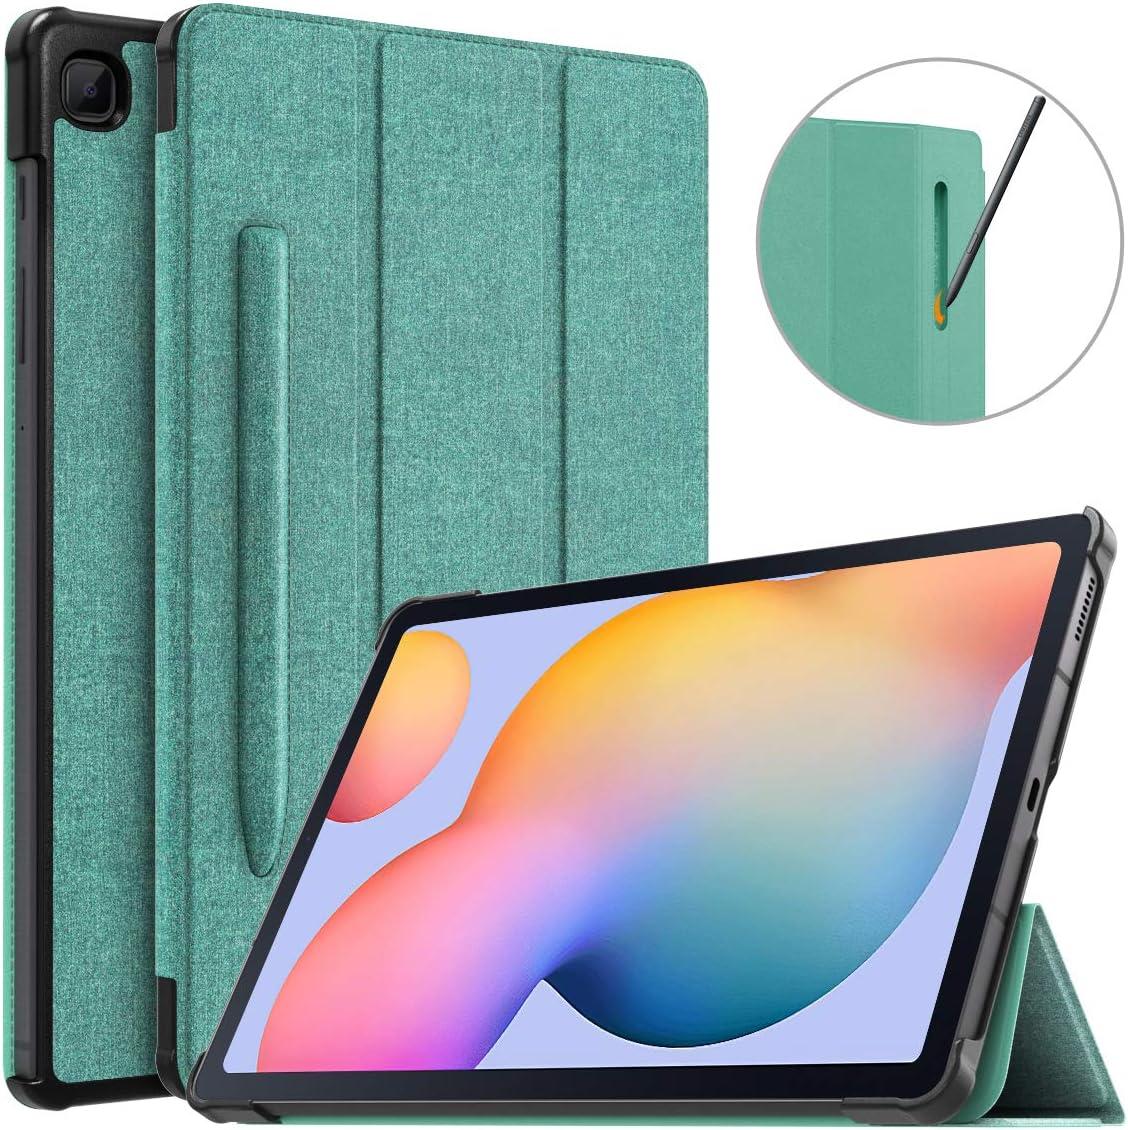 Funda Moko para Samsung Galaxy Tab S6 Lite 10.4 2020 (R5HX)